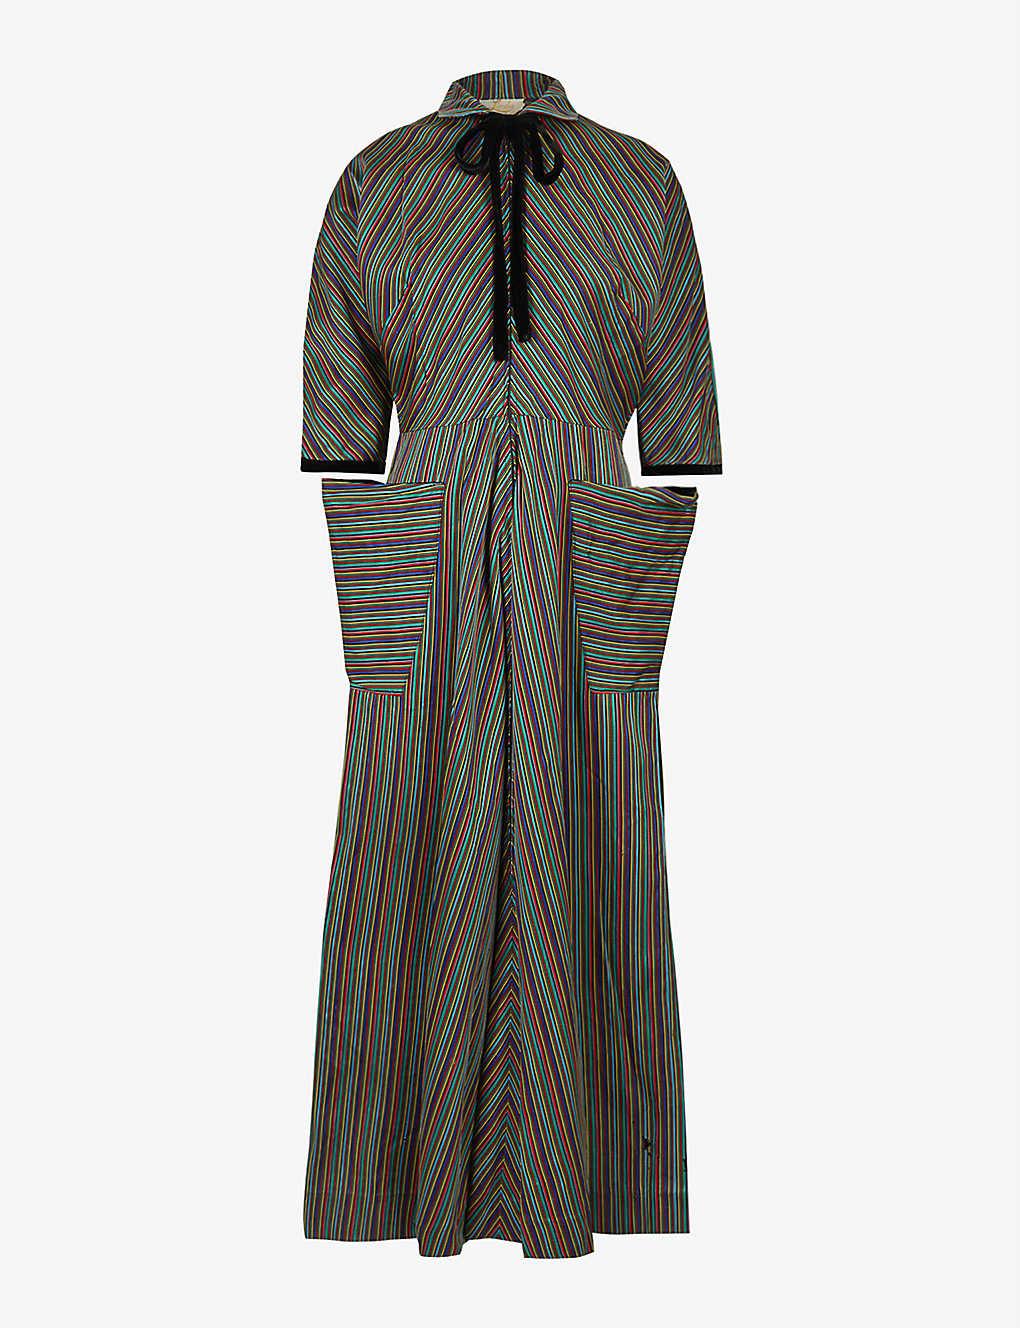 Pre-loved 1930s striped jacquard maxi dress